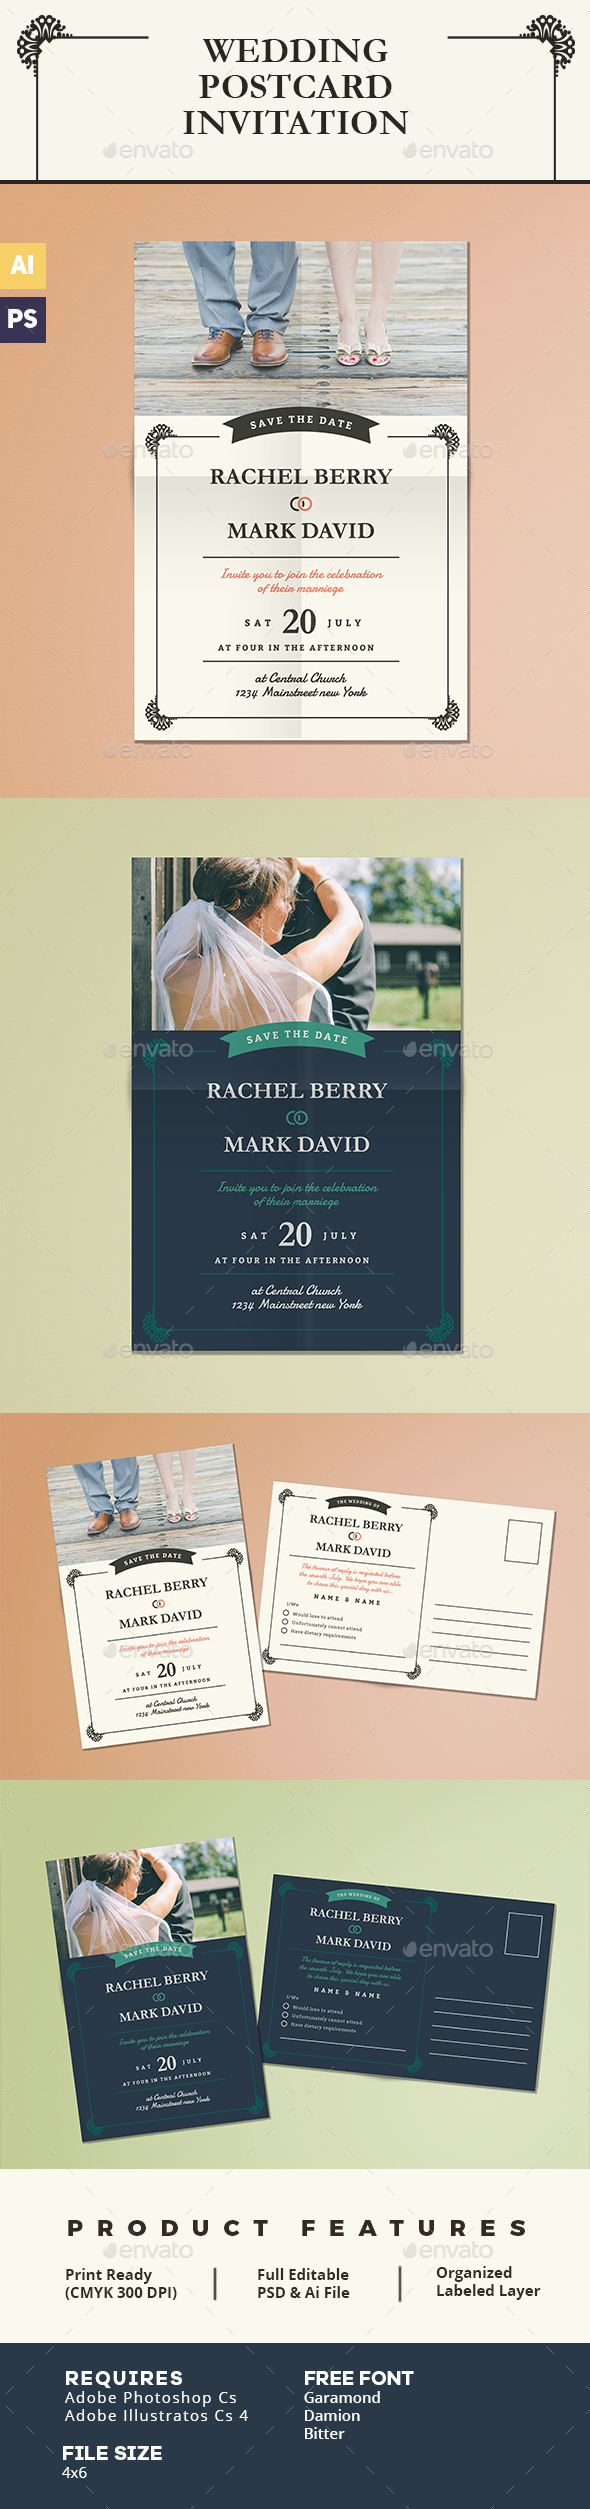 Elegant Wedding Postcard Invitation